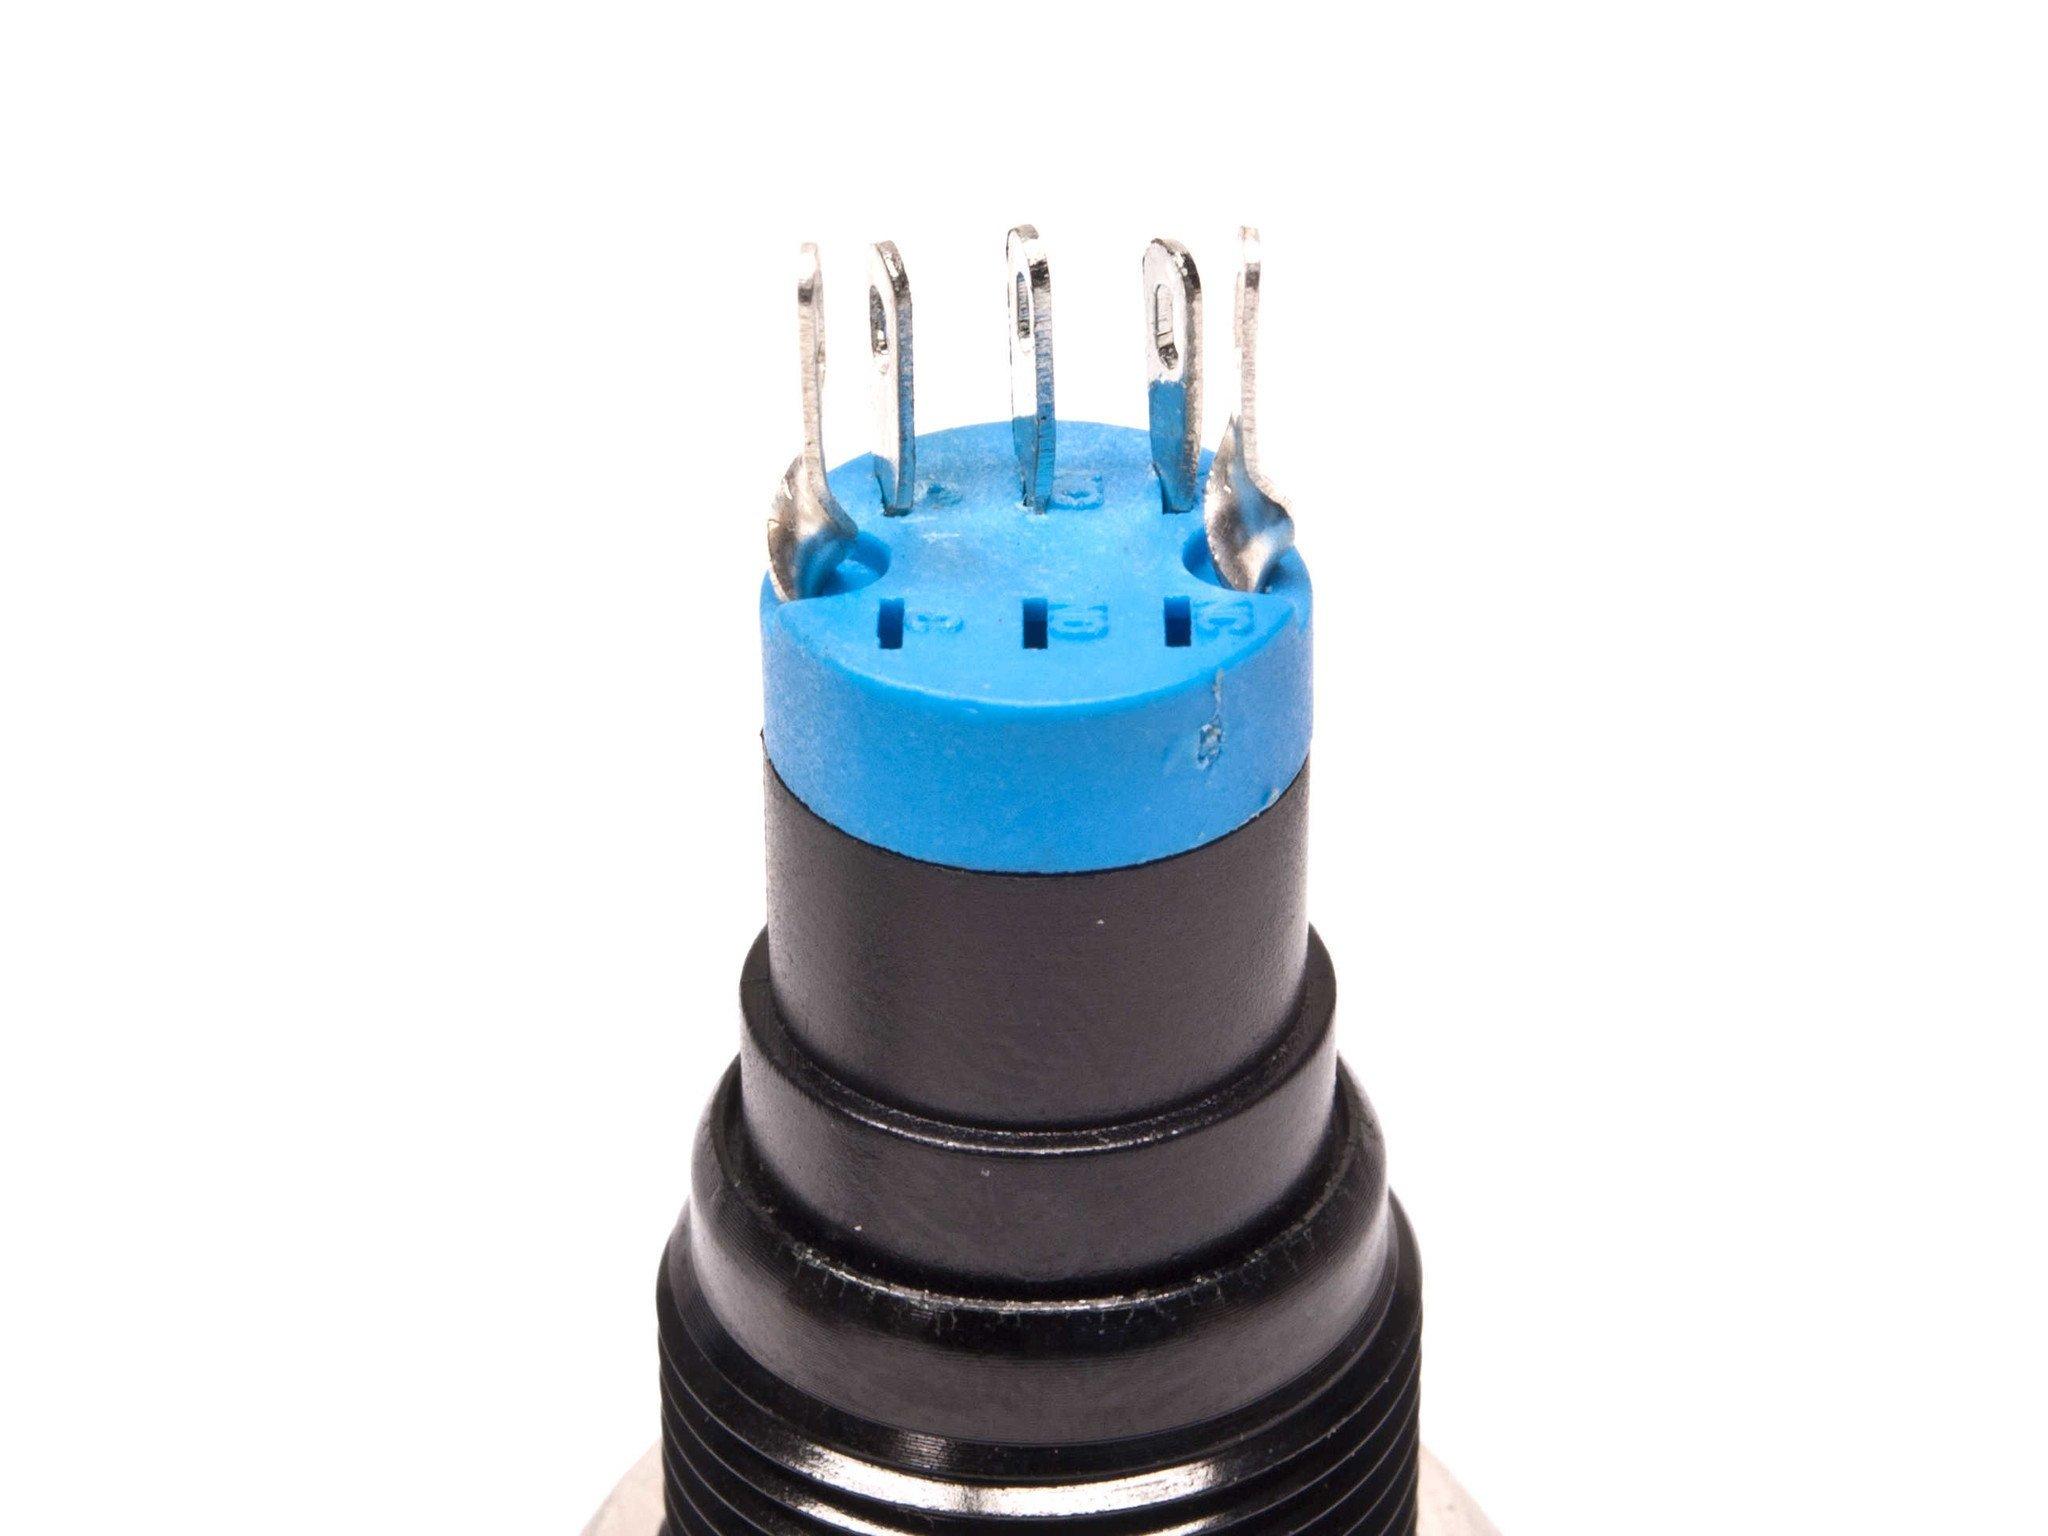 mod/smart Blue Illuminated Bulgin Style Momentary Vandal Switch - 16mm -Black Housing - Ring Illumination